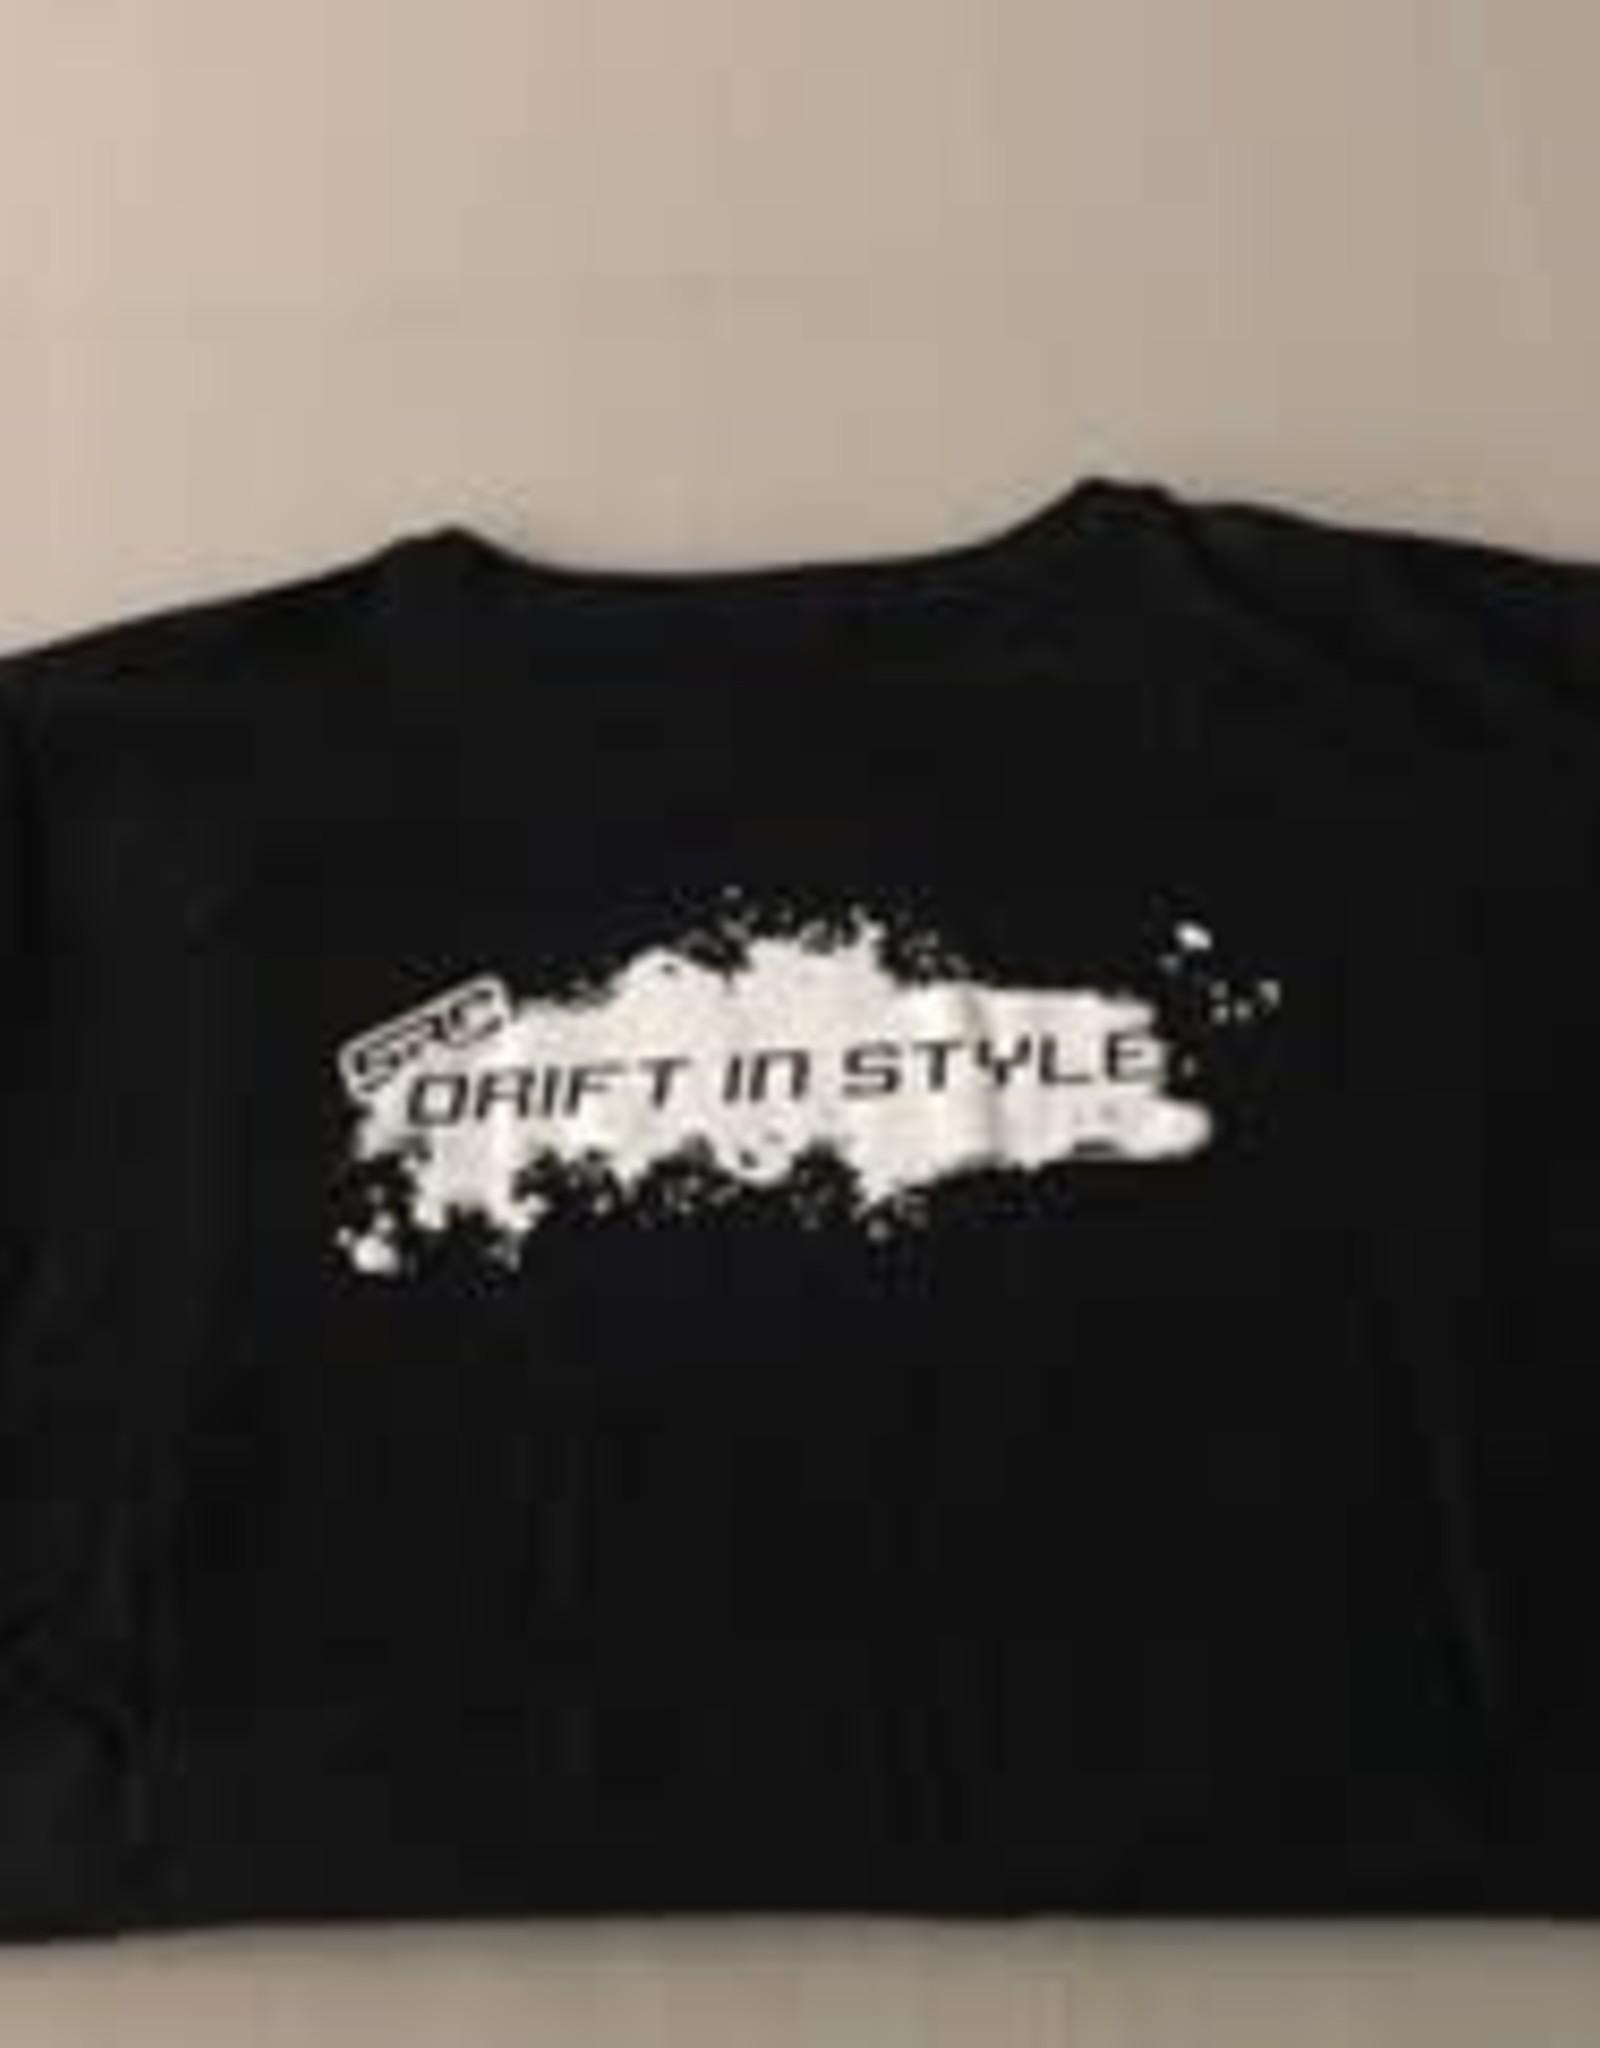 SRC SRCTXLBK SRC T Shirt Black Xtra Large